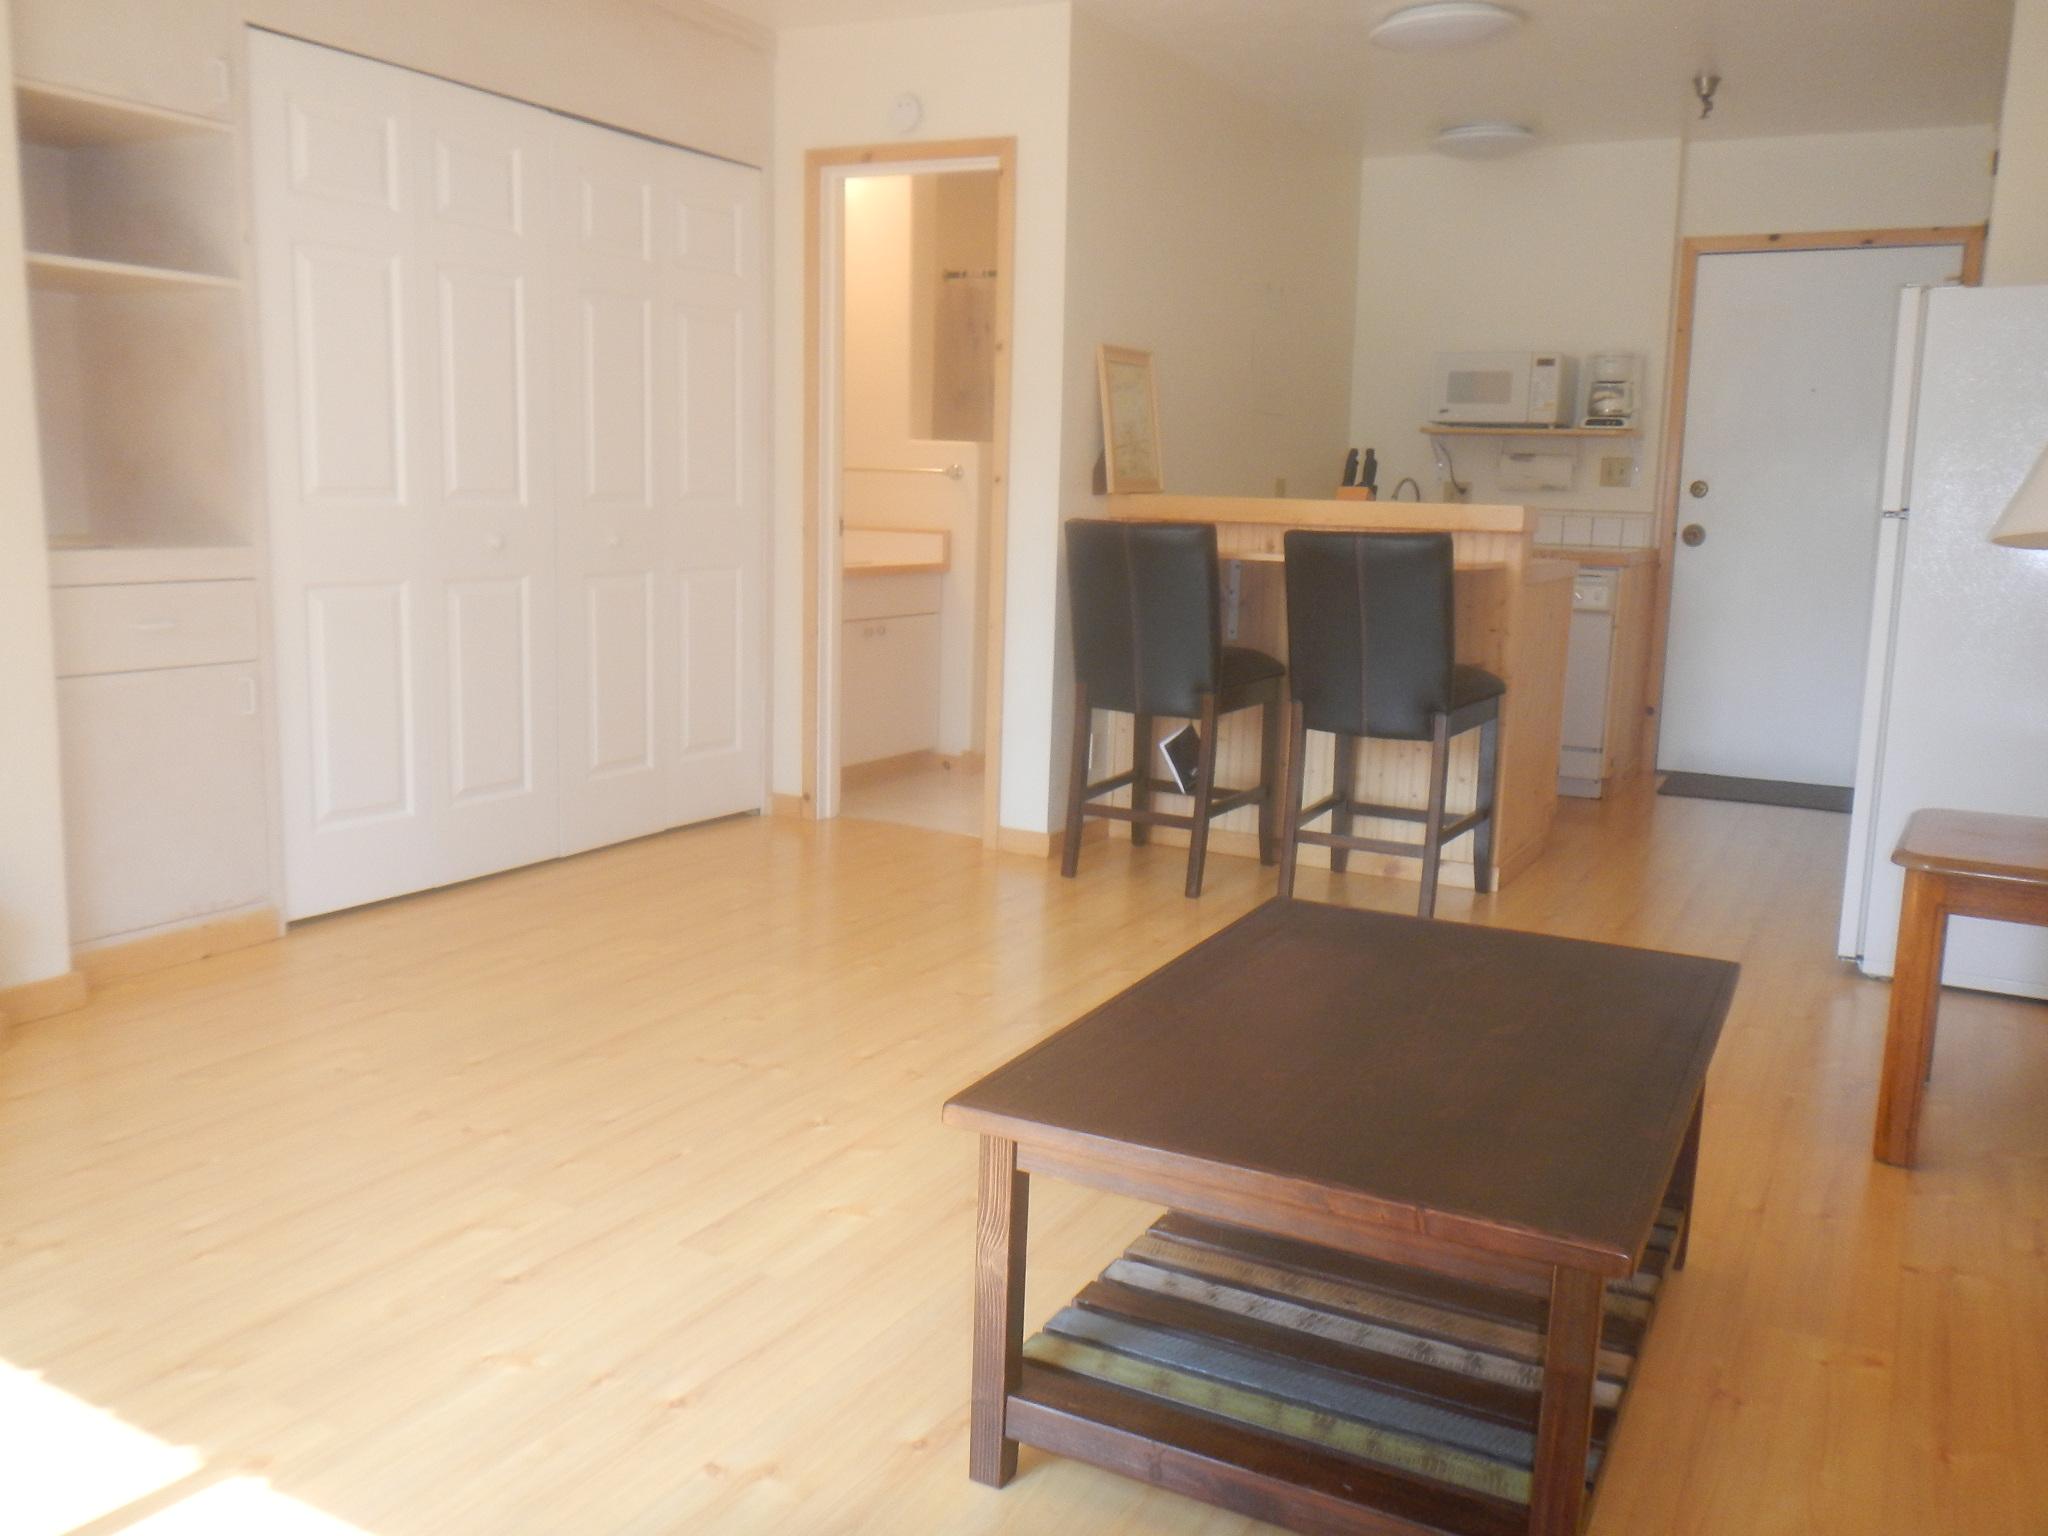 Additional photo for property listing at Affordable Sutio 113 Angani Way #2058 Sun Valley, Idaho 83353 États-Unis